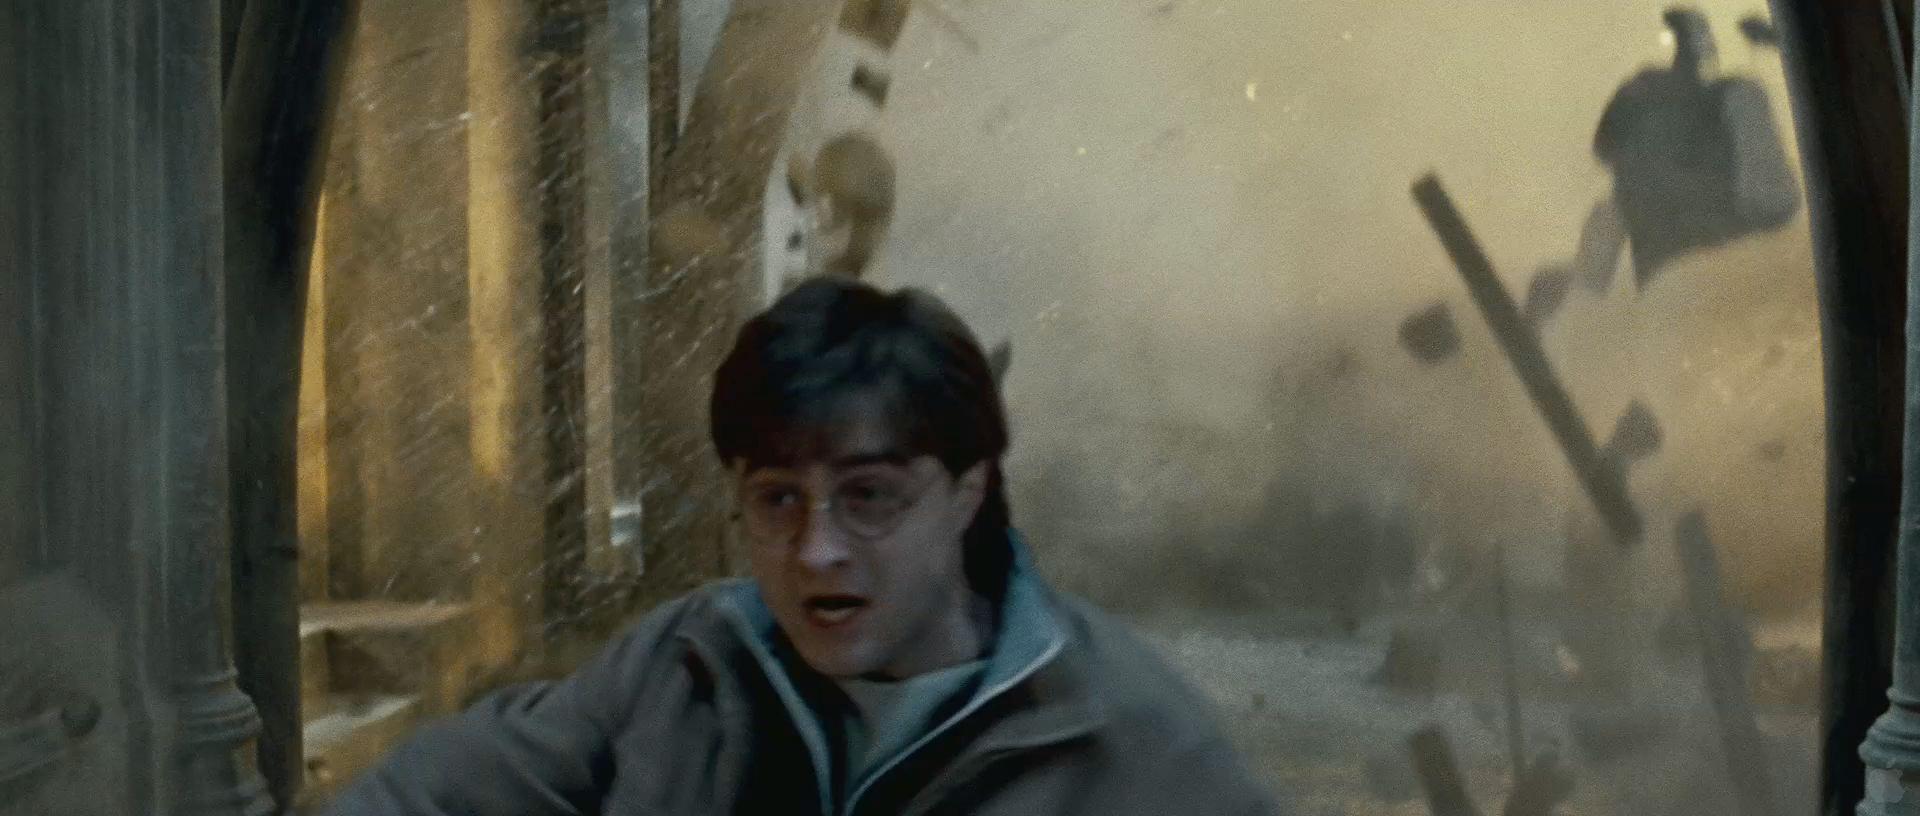 Harry Potter BlogHogwarts HP7 2 Trailer 84